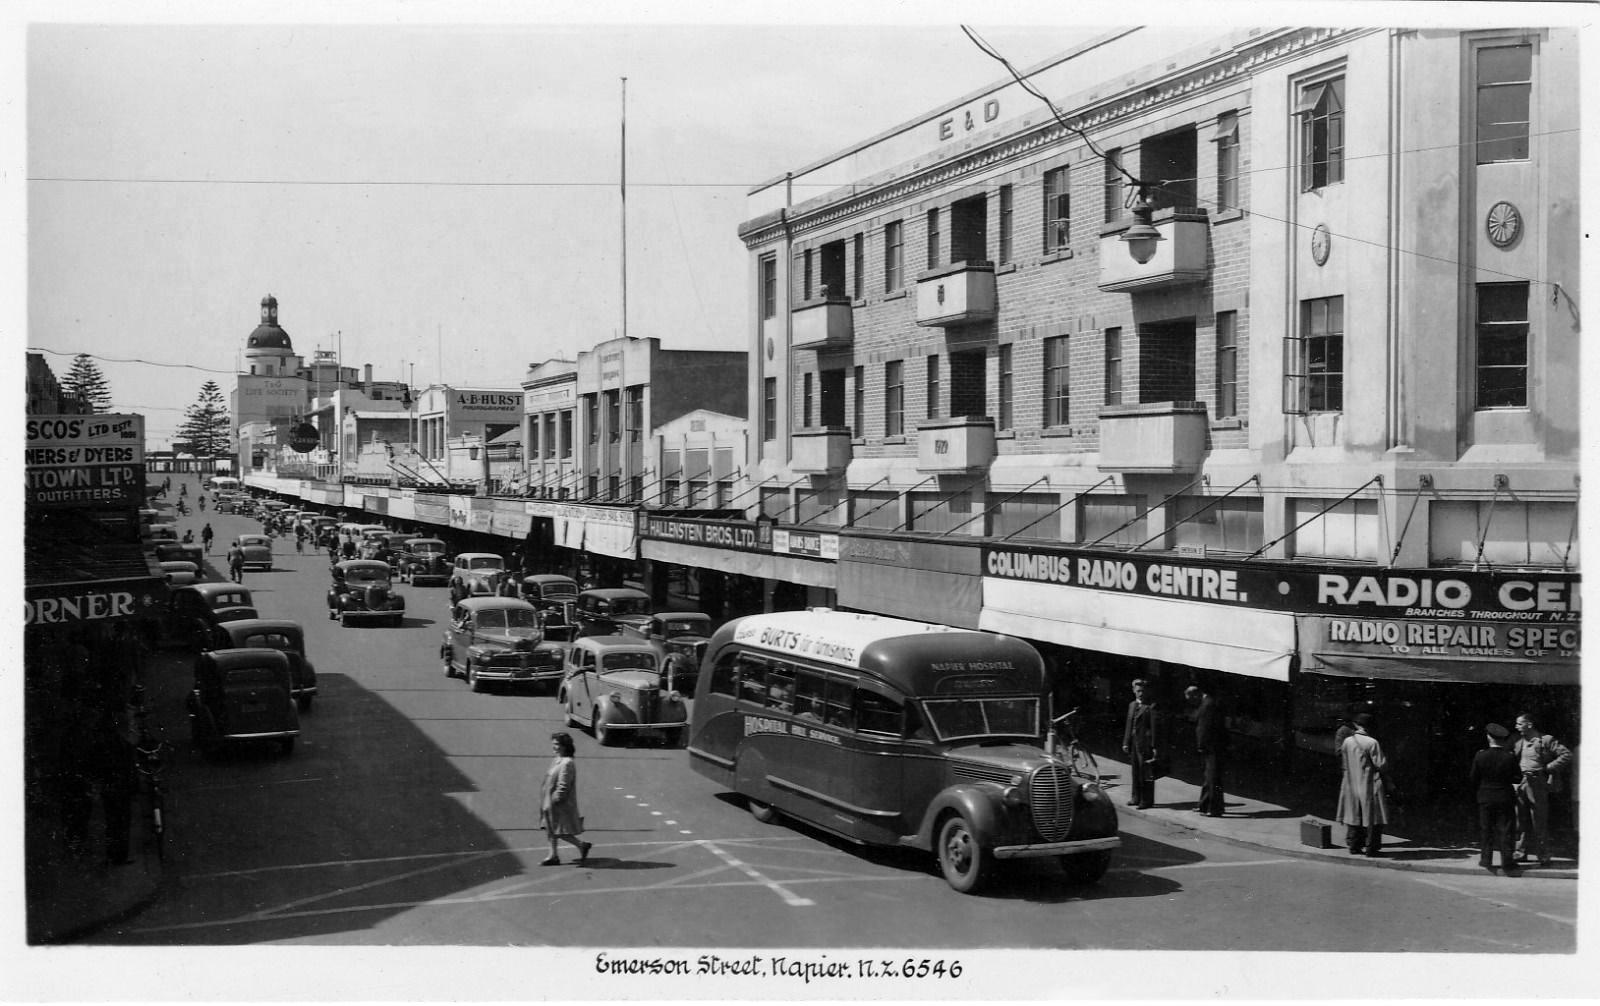 transpress nz: traffic in Emerson Street, Napier, late 1940s